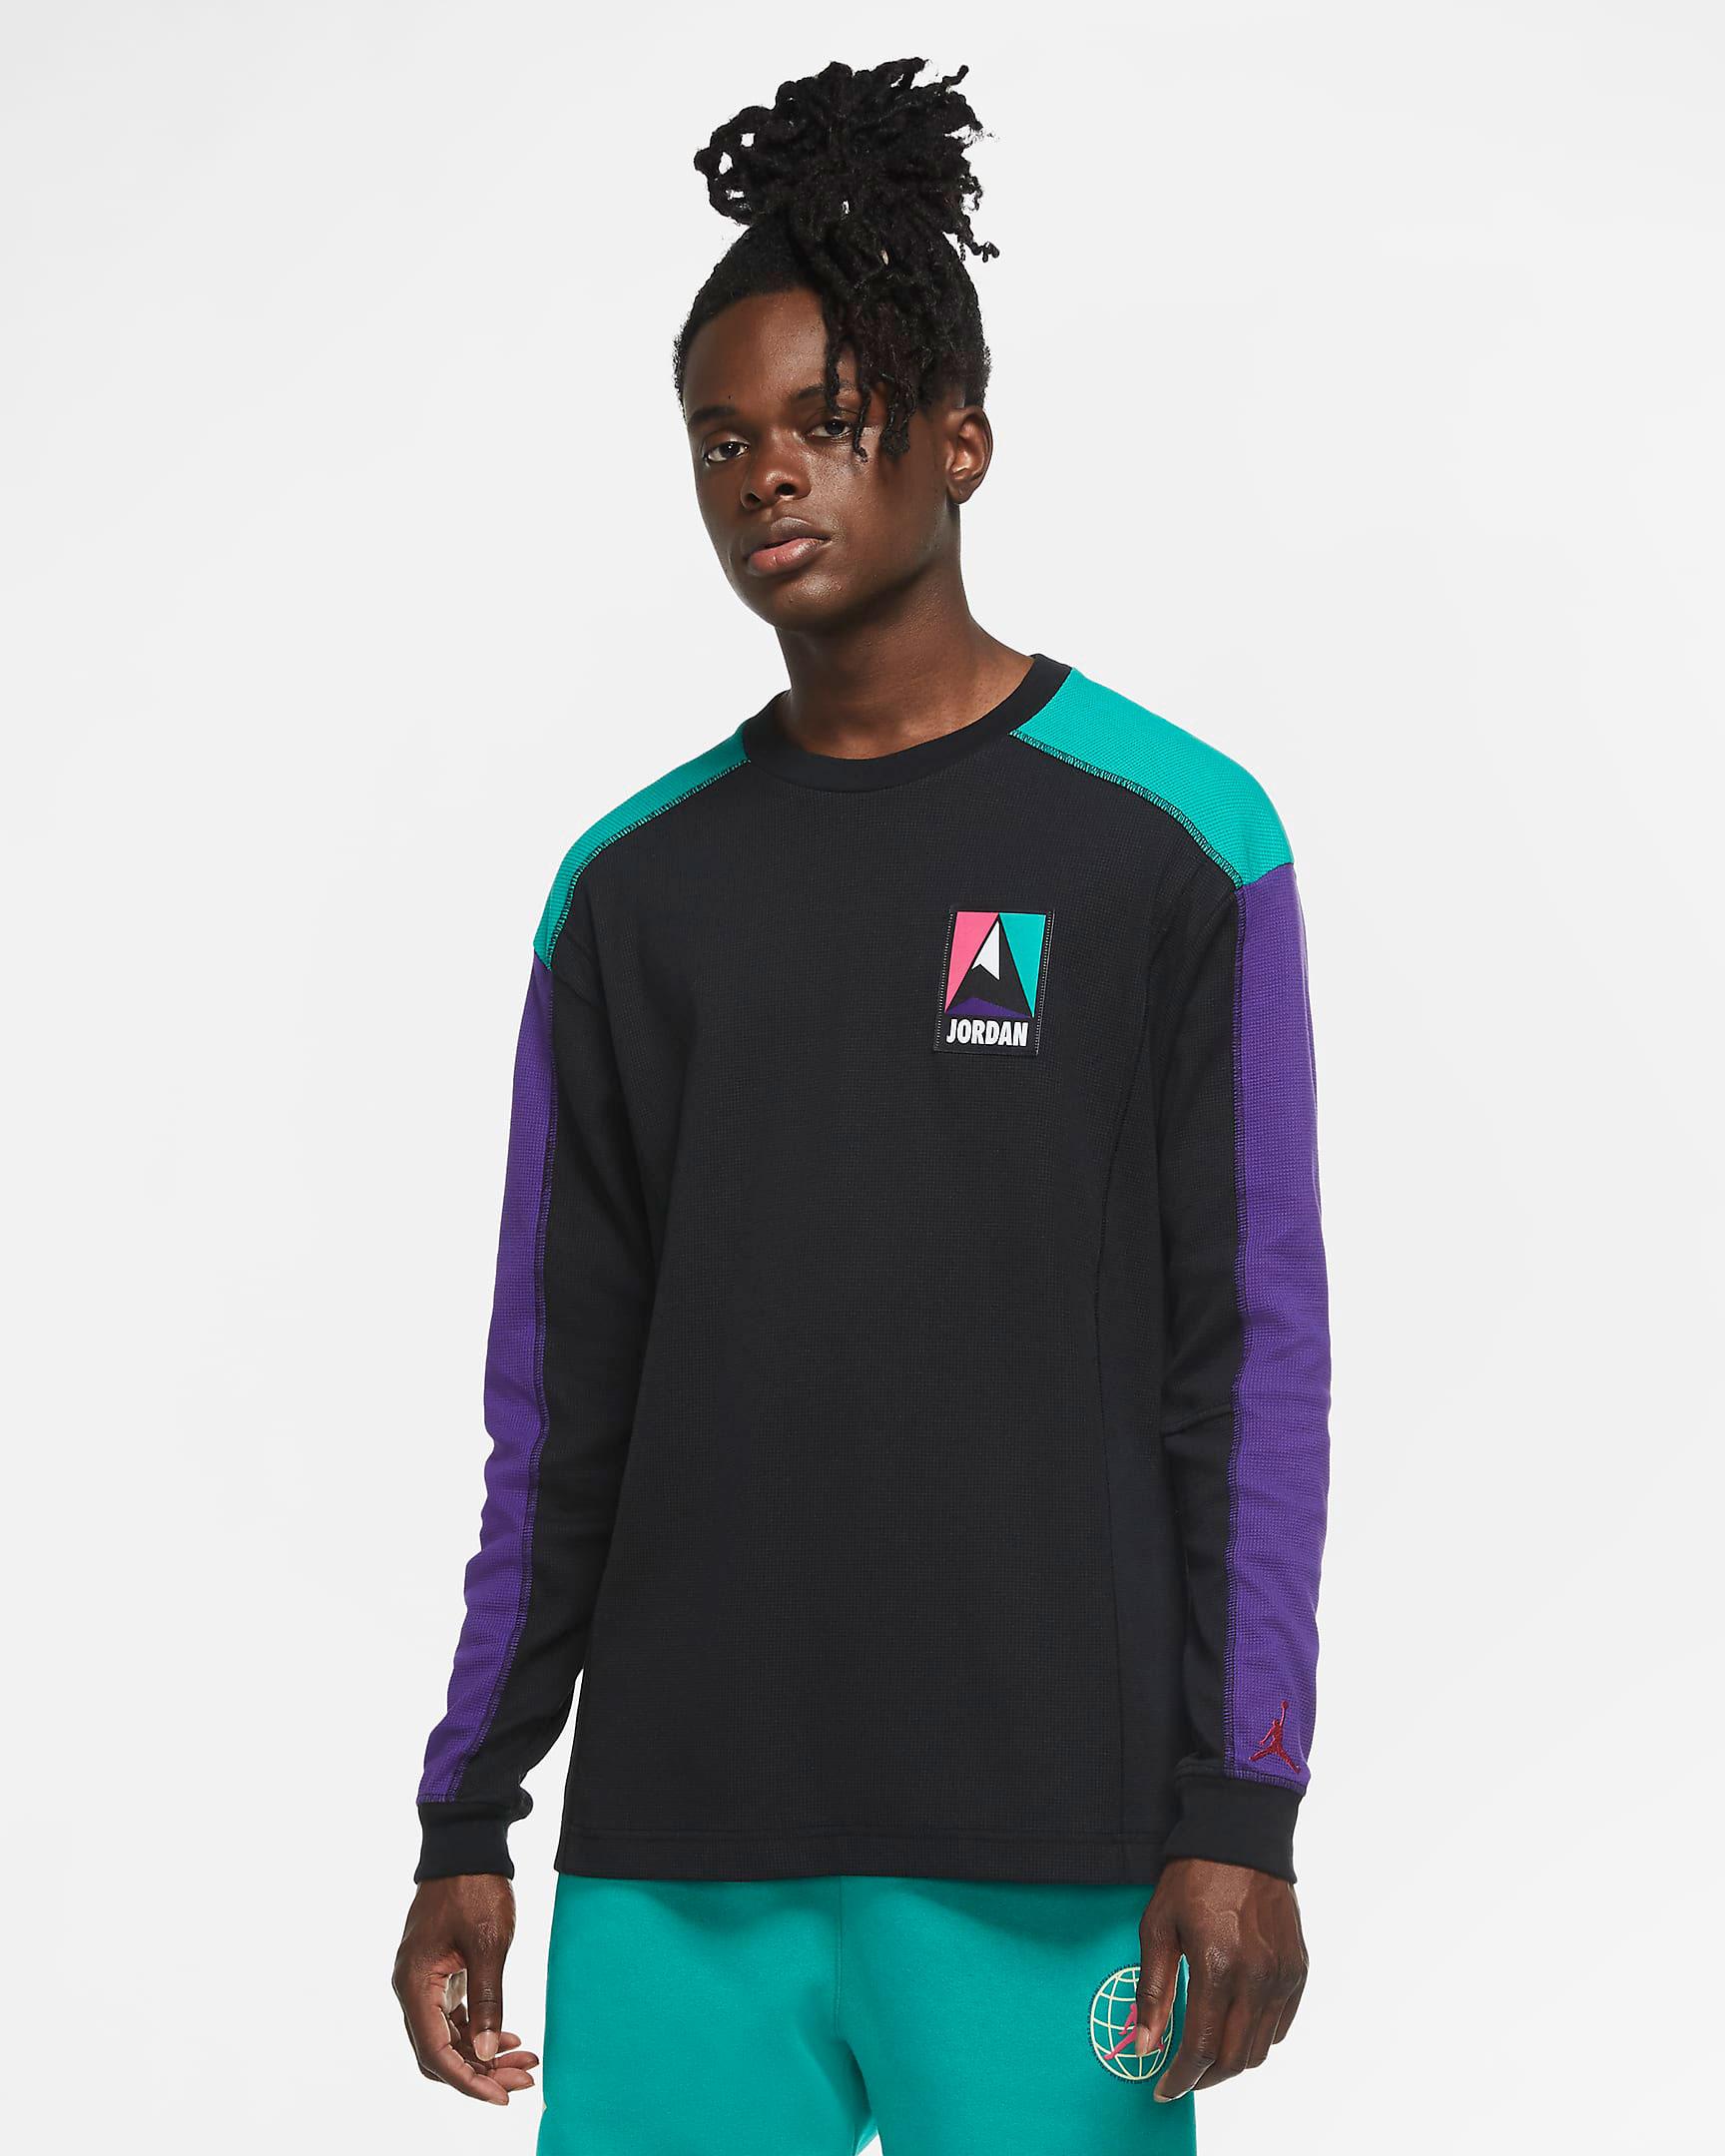 jordan-12-dark-concord-sweatshirt-match